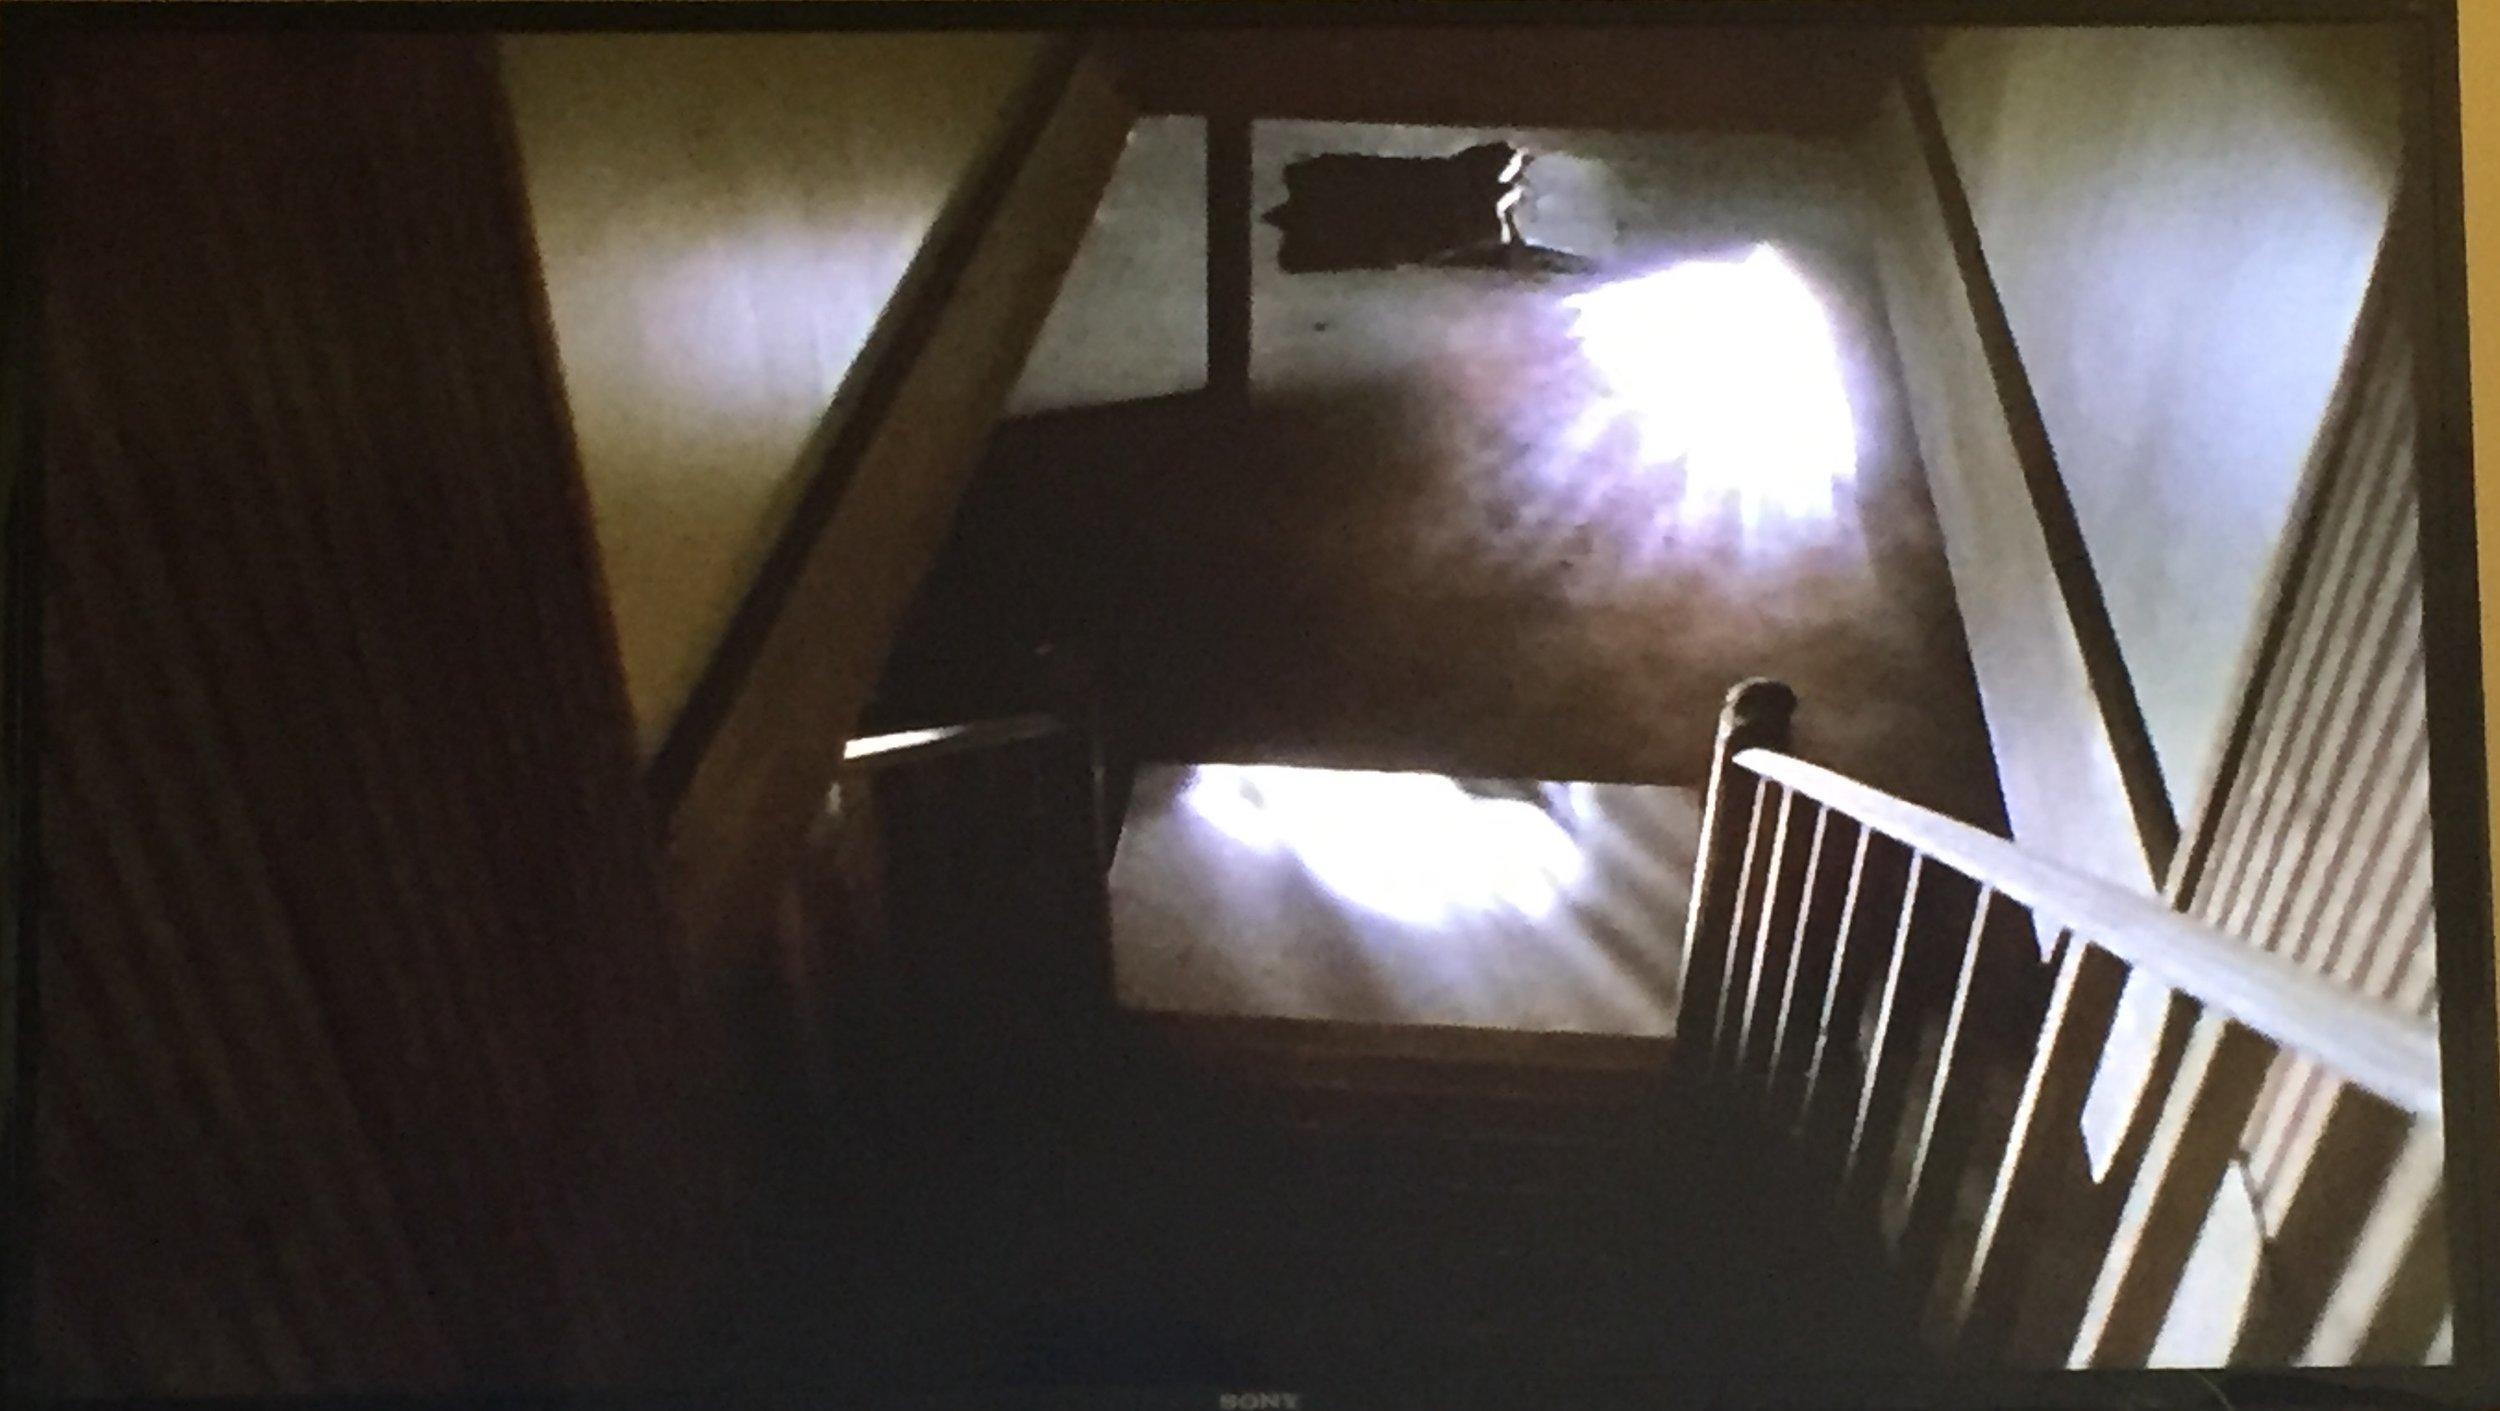 That dark basement looks awfully bright...